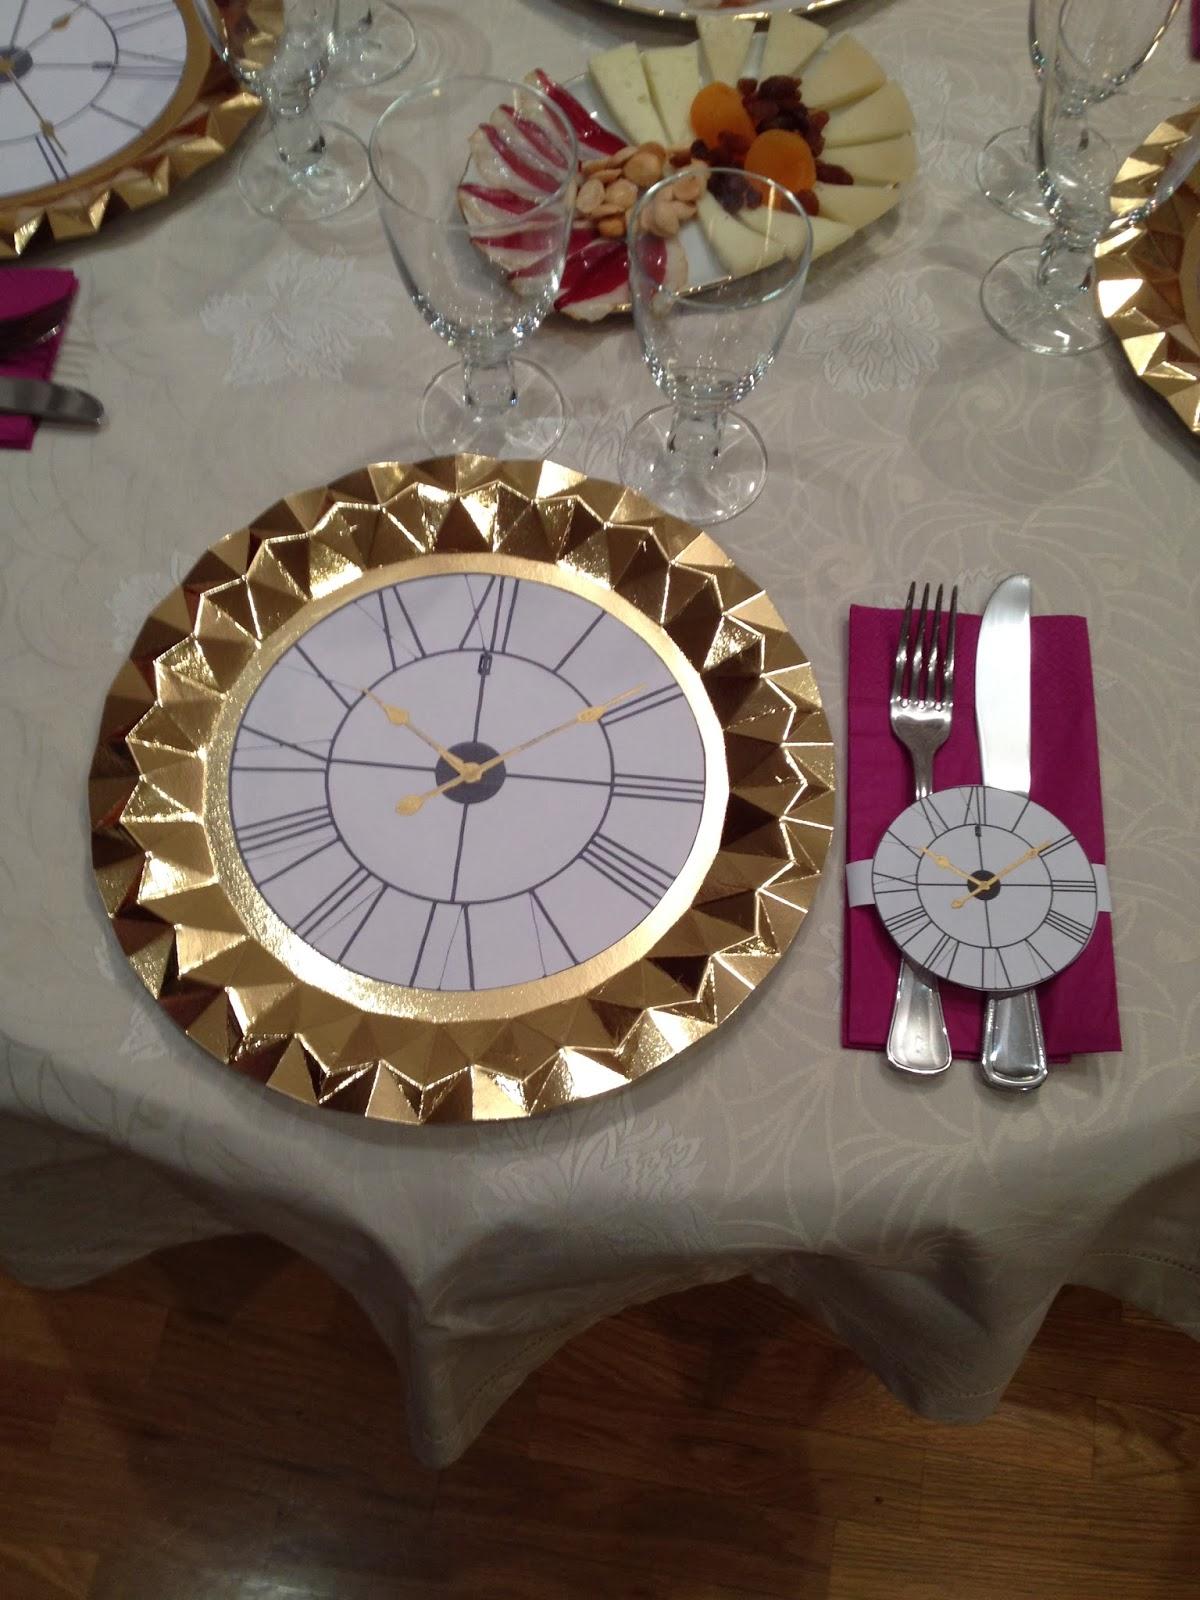 Ideas para una decoraci n de nochevieja fin de a o - Decoracion mesa nochevieja ...